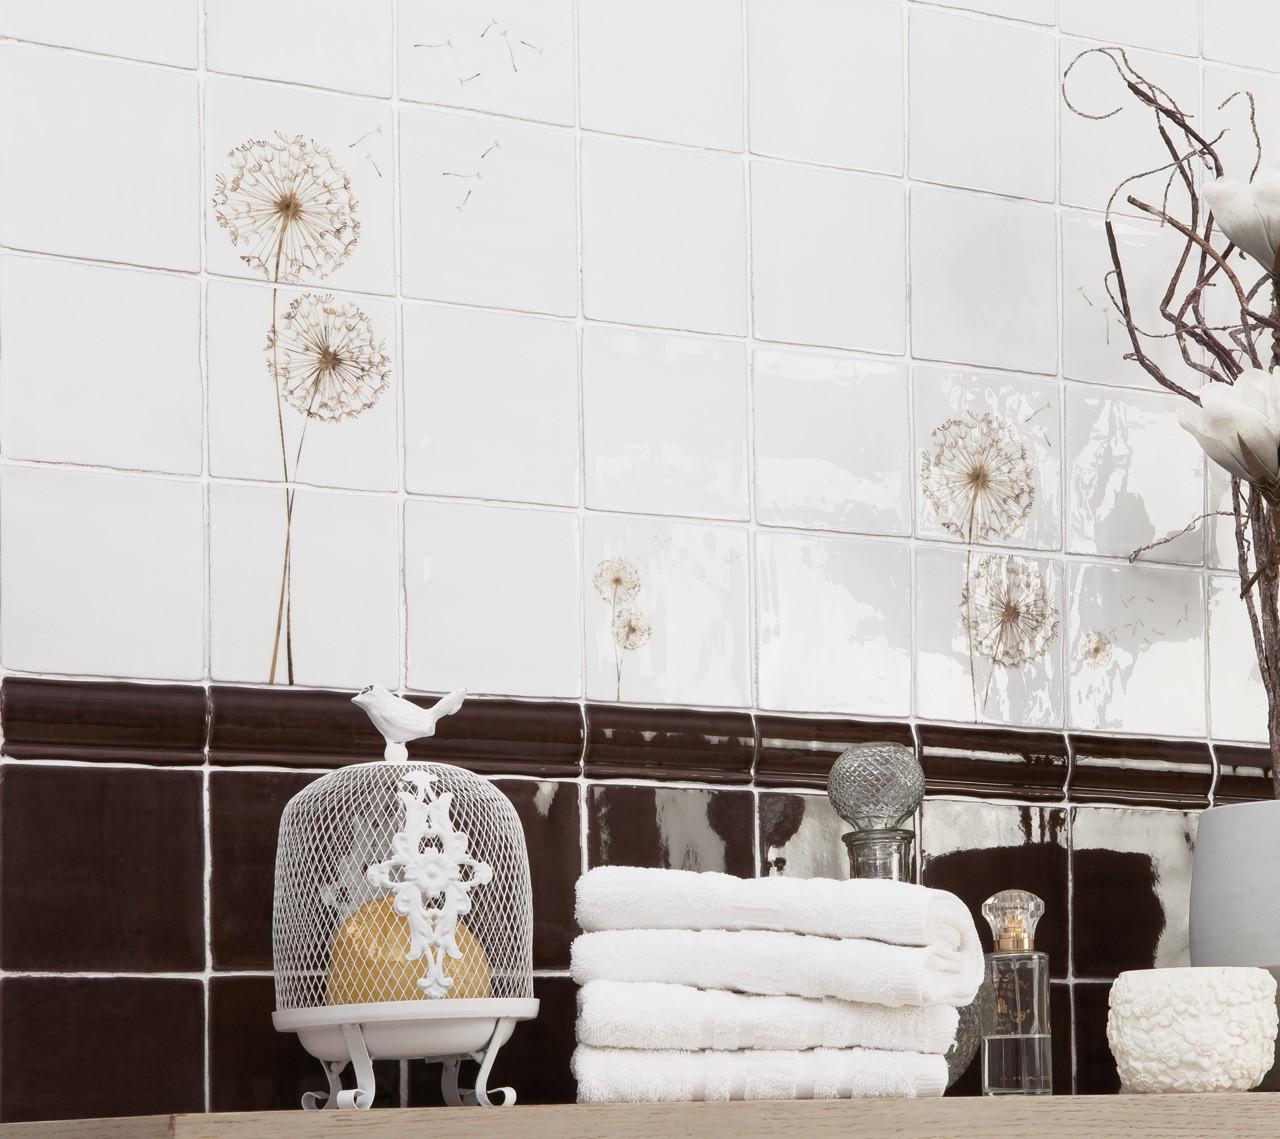 antic-obklady-13x13-dekor-malovane-handmade-dandelion-pampeliska-03